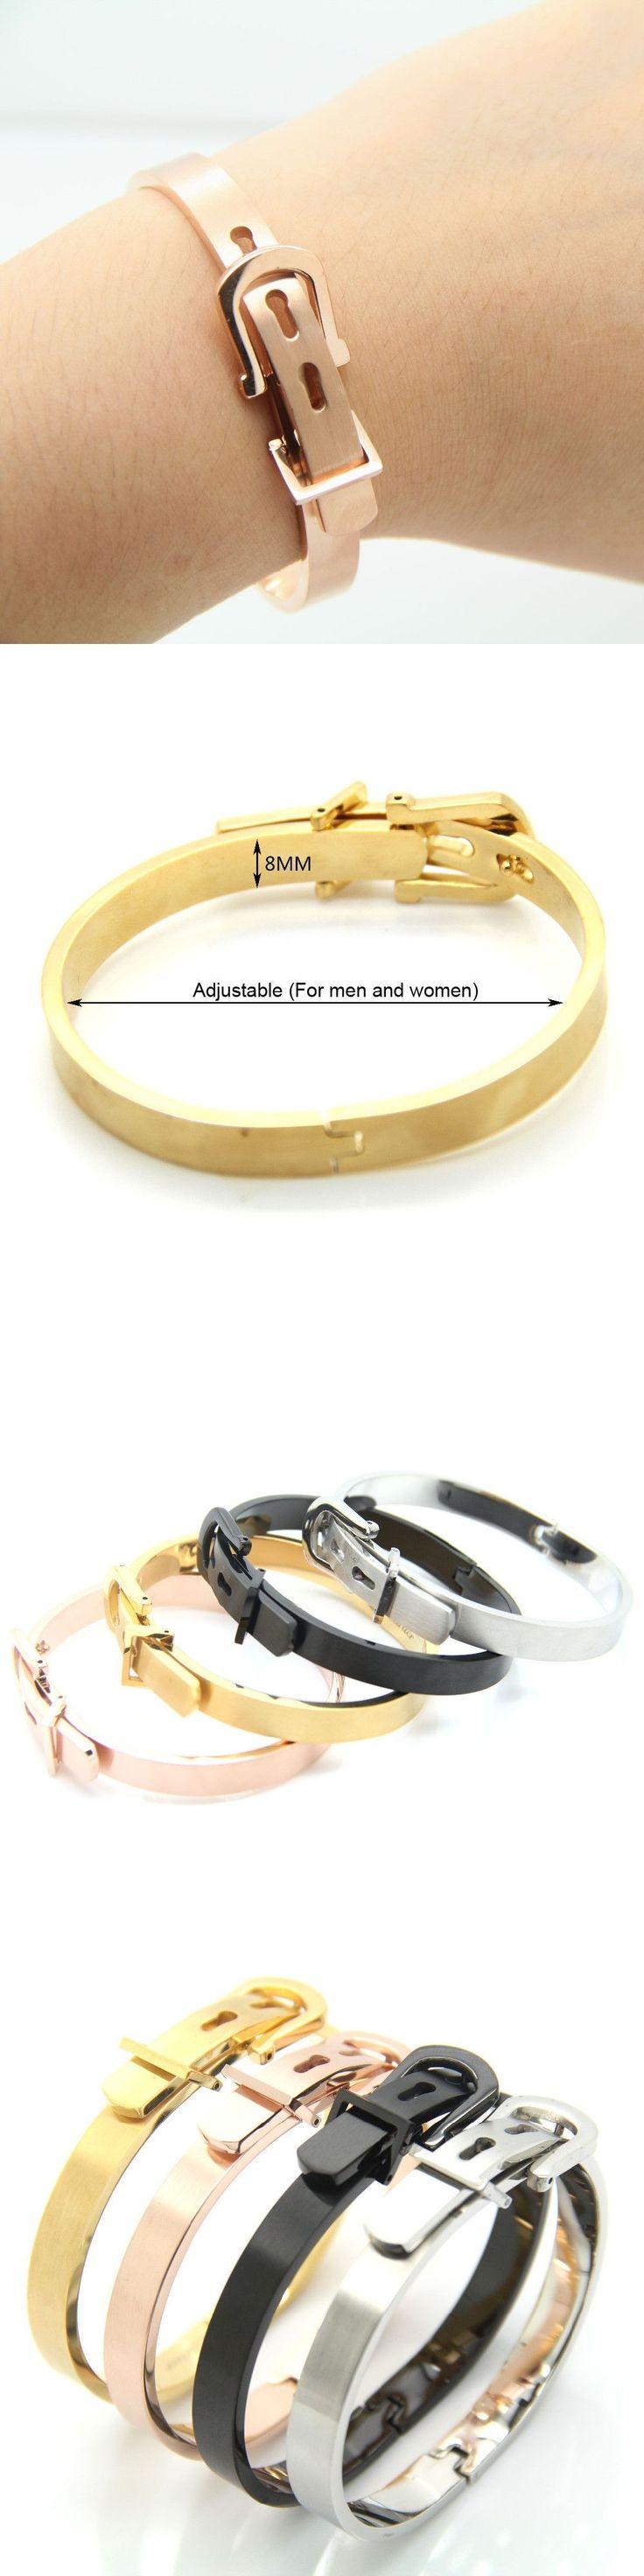 Famous Fashion Brand Jewelry Bangle Unisex Women/Men Jewelry Wholesale 4 Colors Gold Color Round Trendy Belt Bracelets Bangles